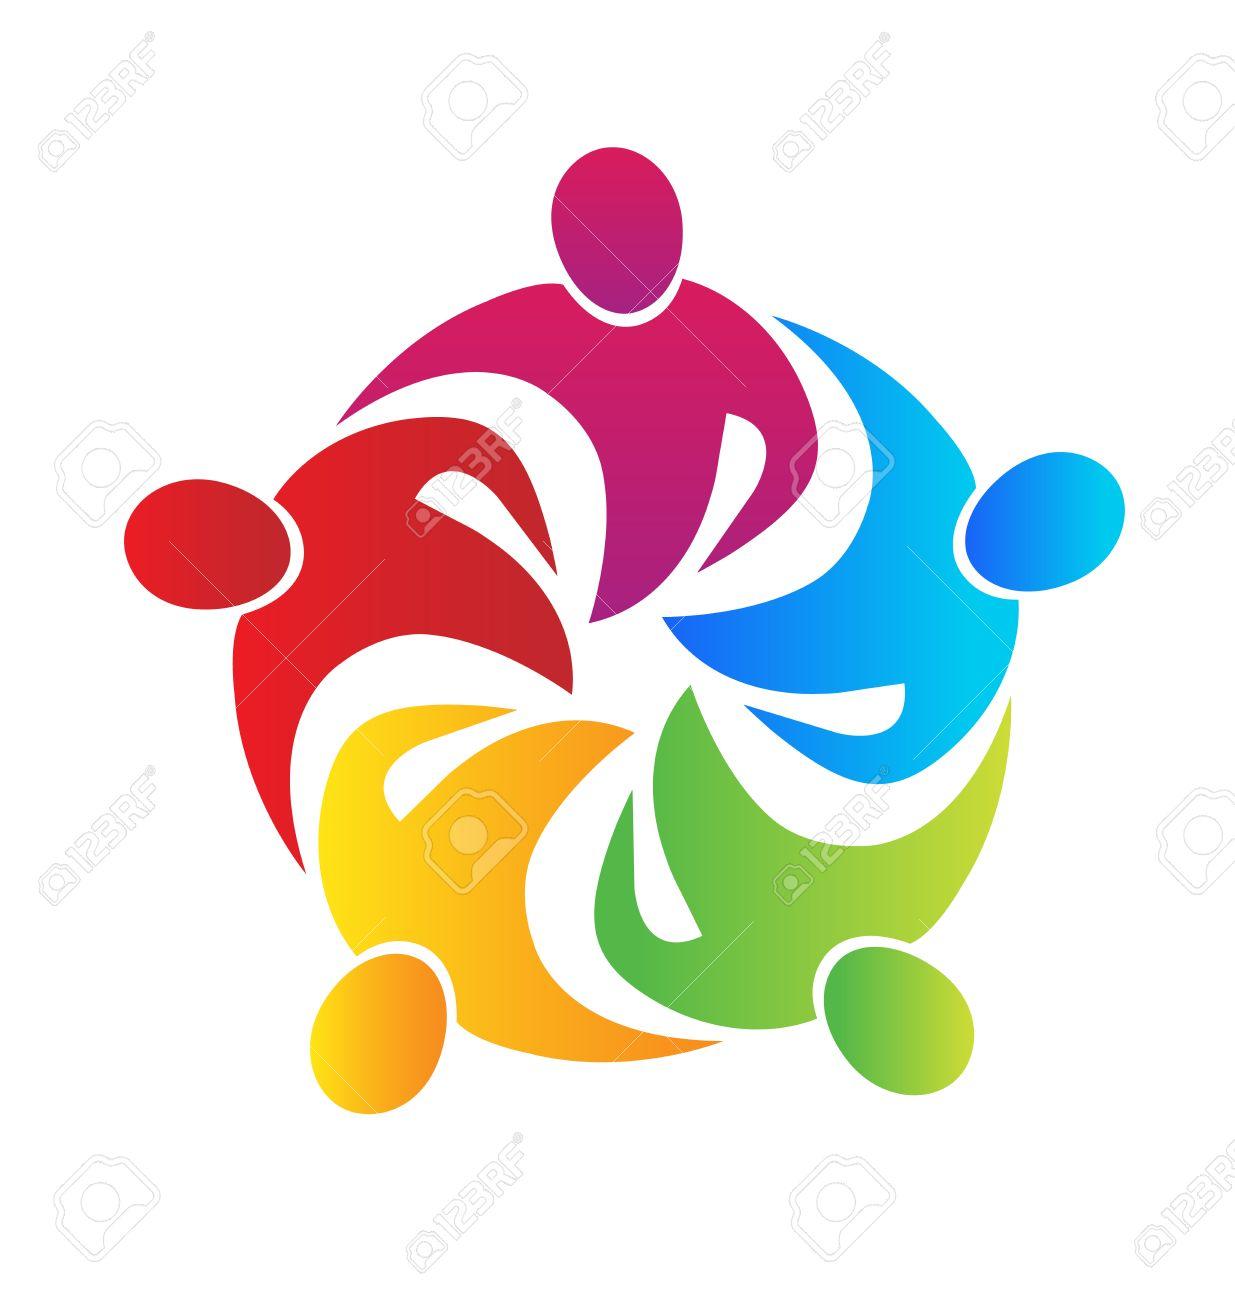 Teamwork Meeting Business People In A Hug Logo Vector Image ...